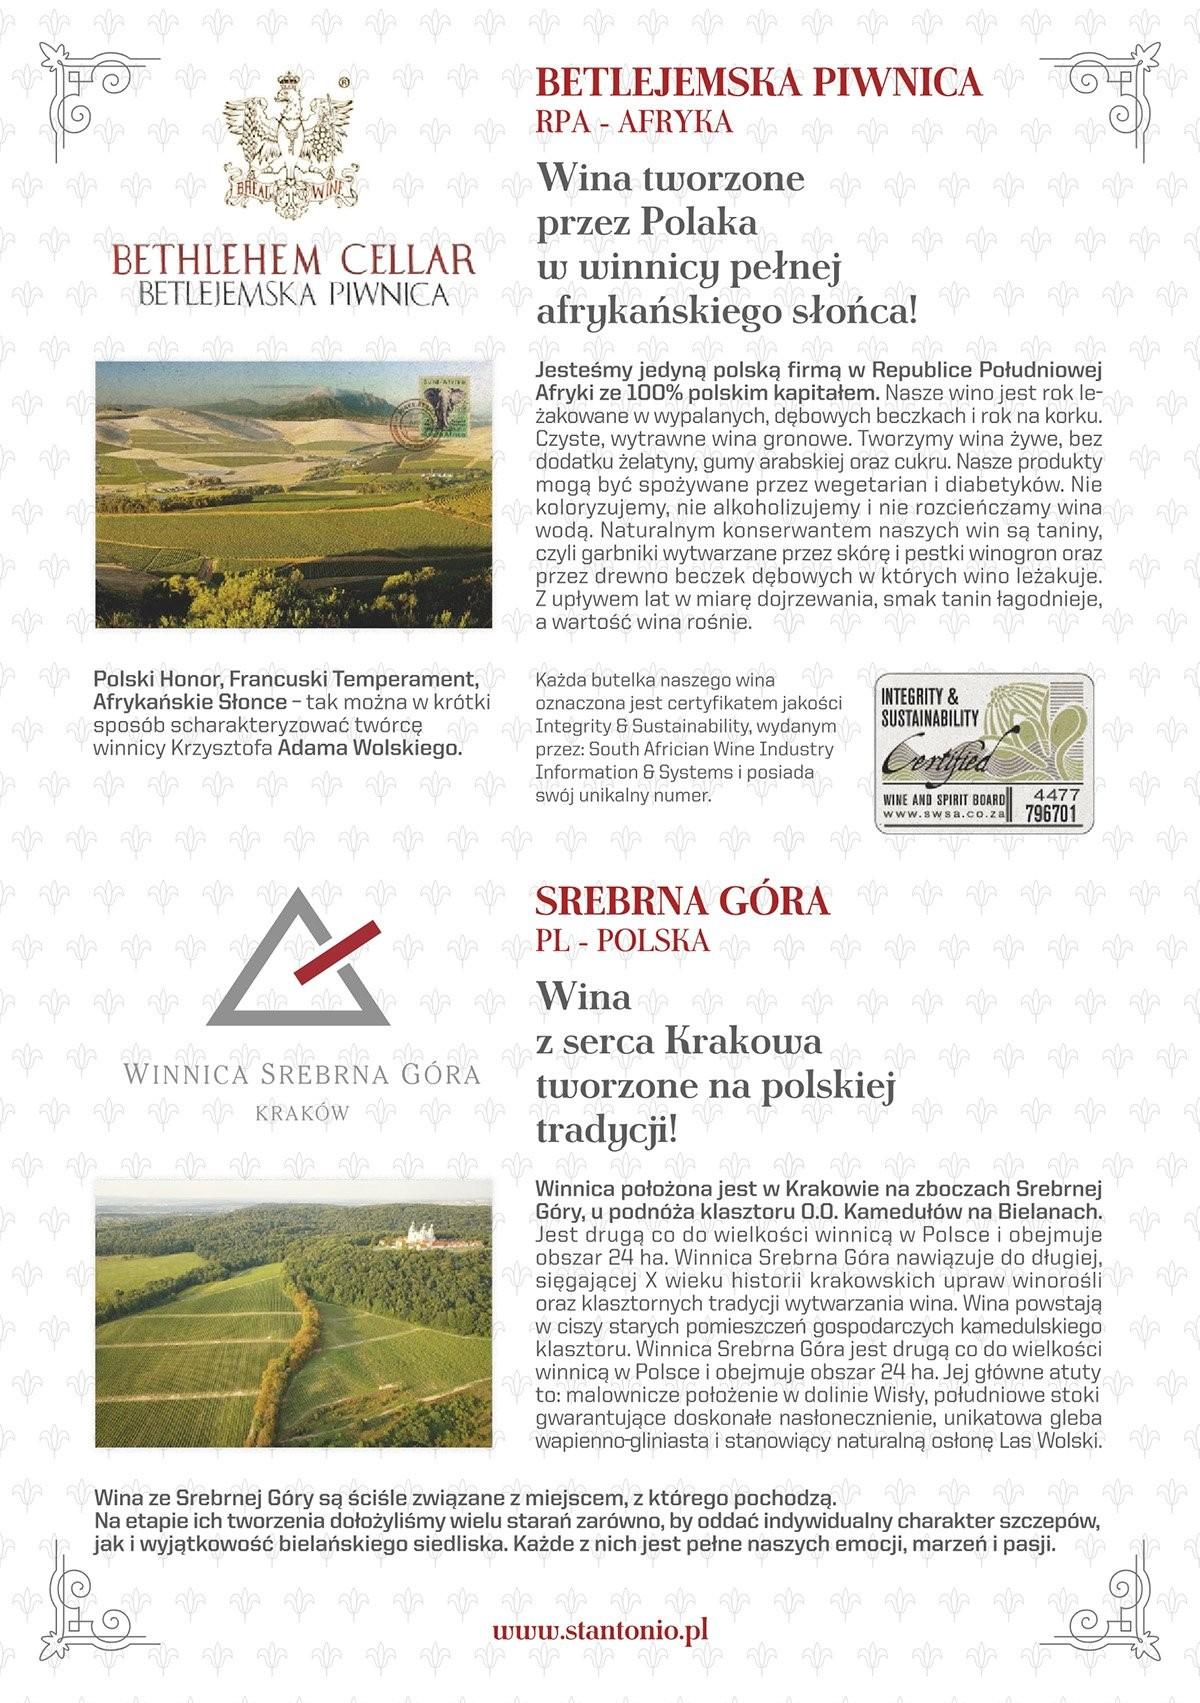 Torzones Lovely Polskie Wina Best torzones